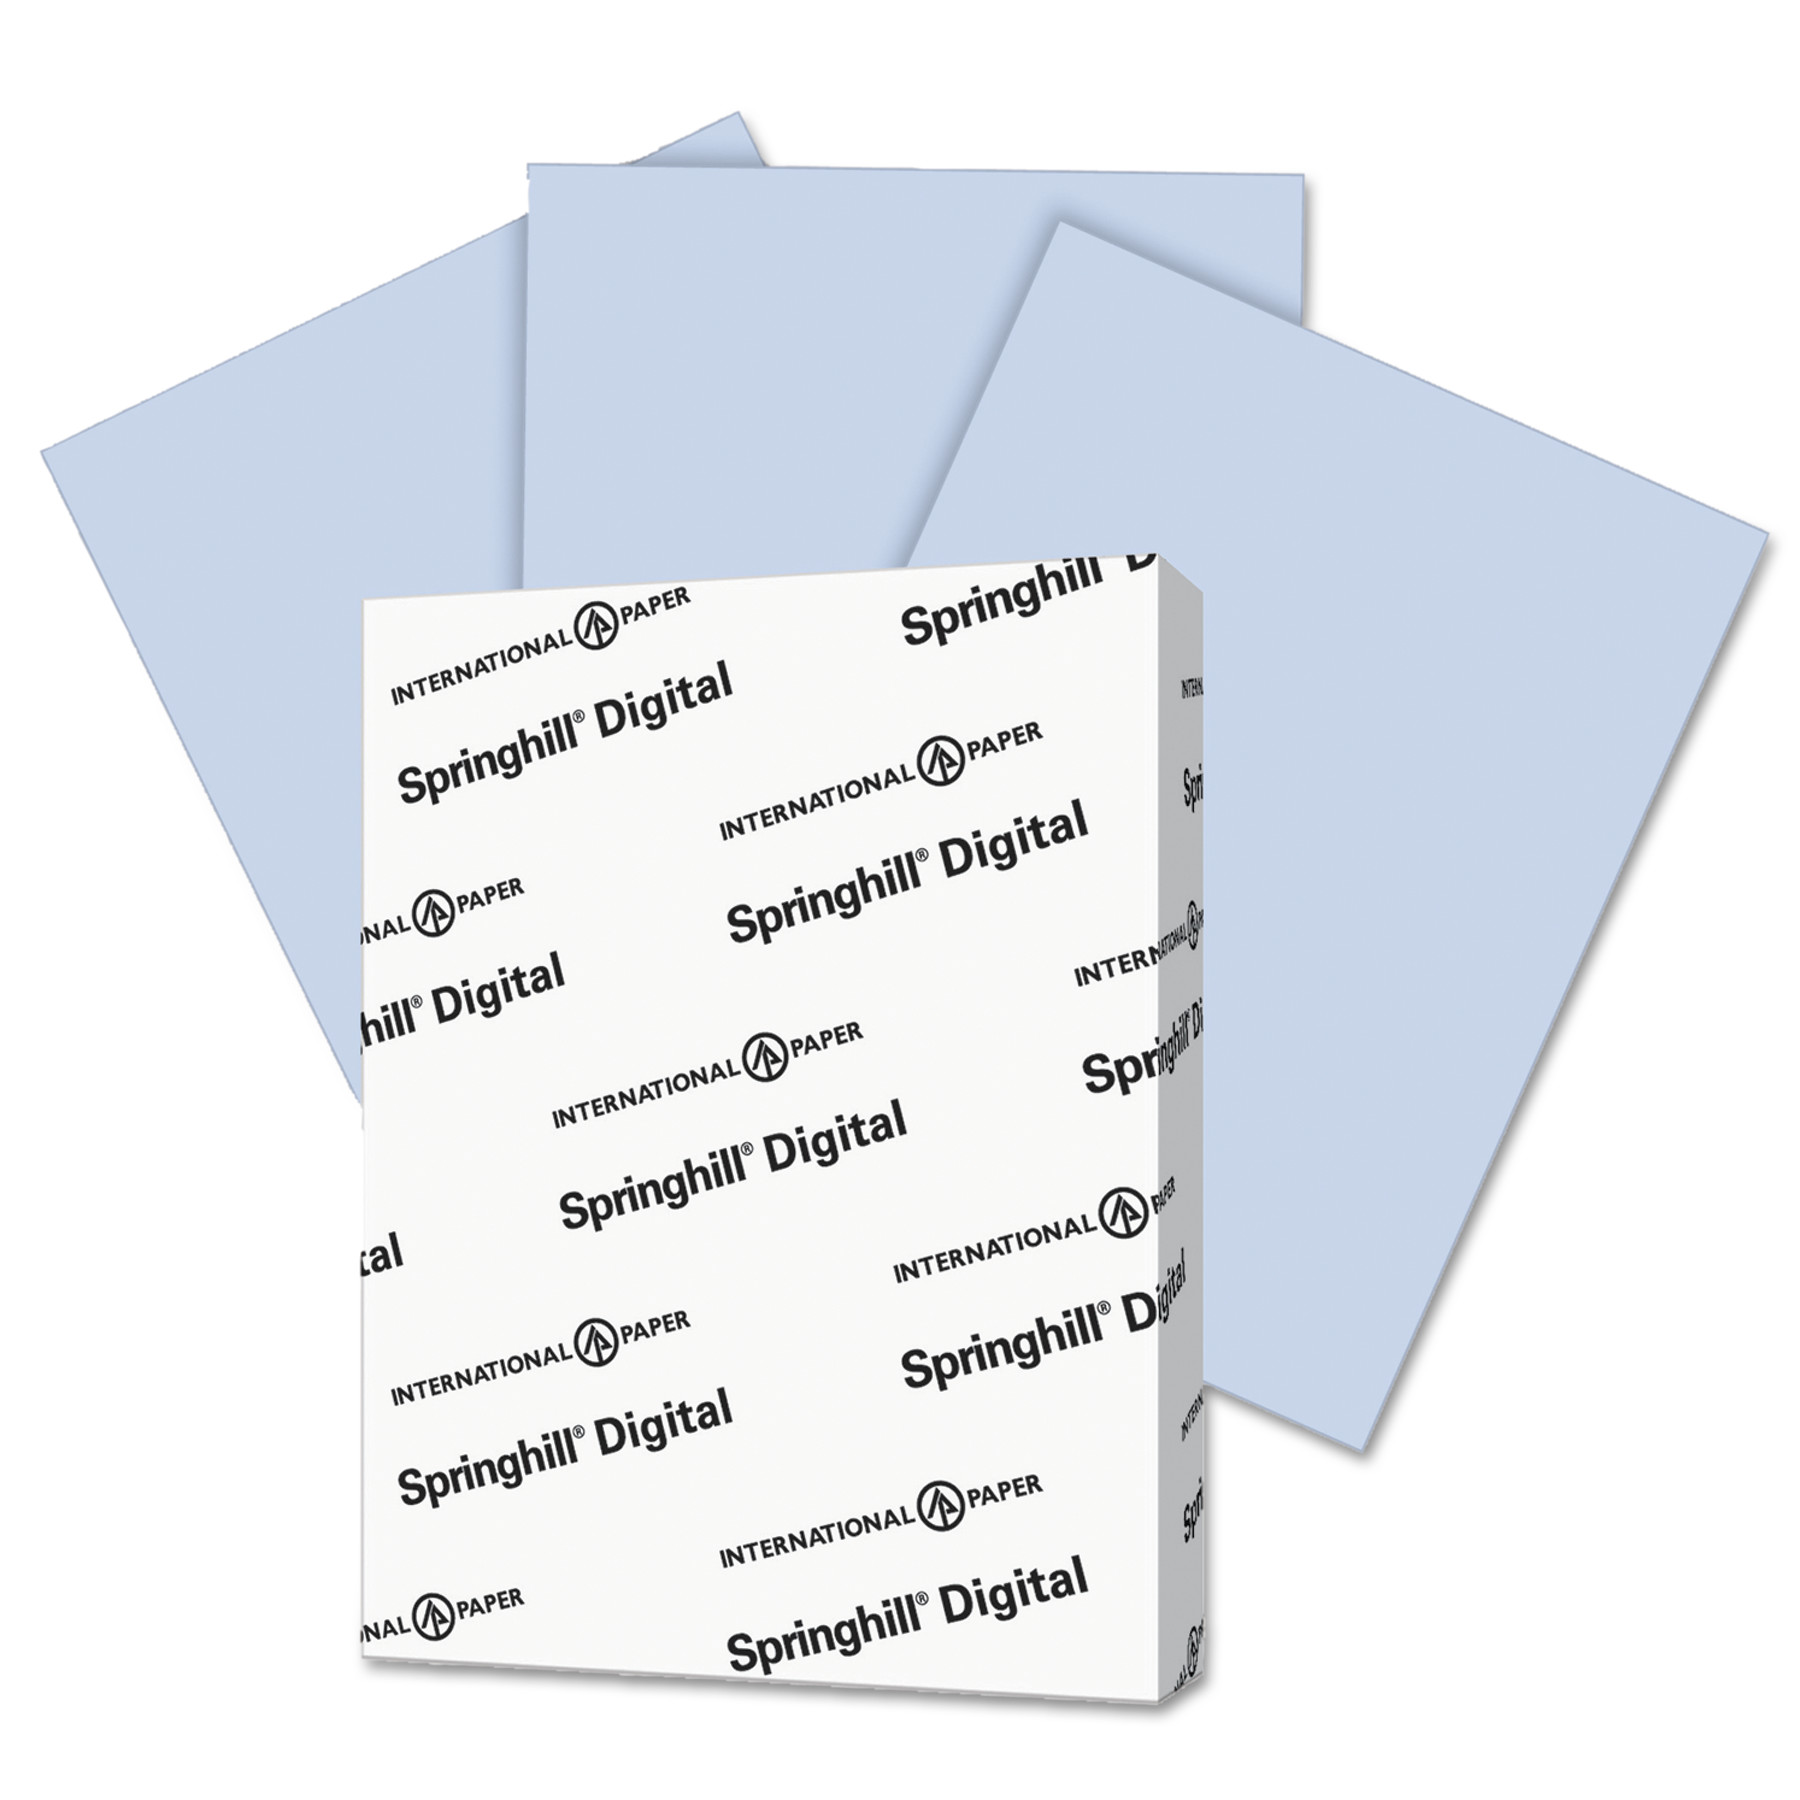 Springhill Digital Vellum Bristol Color Cover, 67 lb, 8 1/2 x 11, Orchid, 250 Sheets/Pack -SGH057000